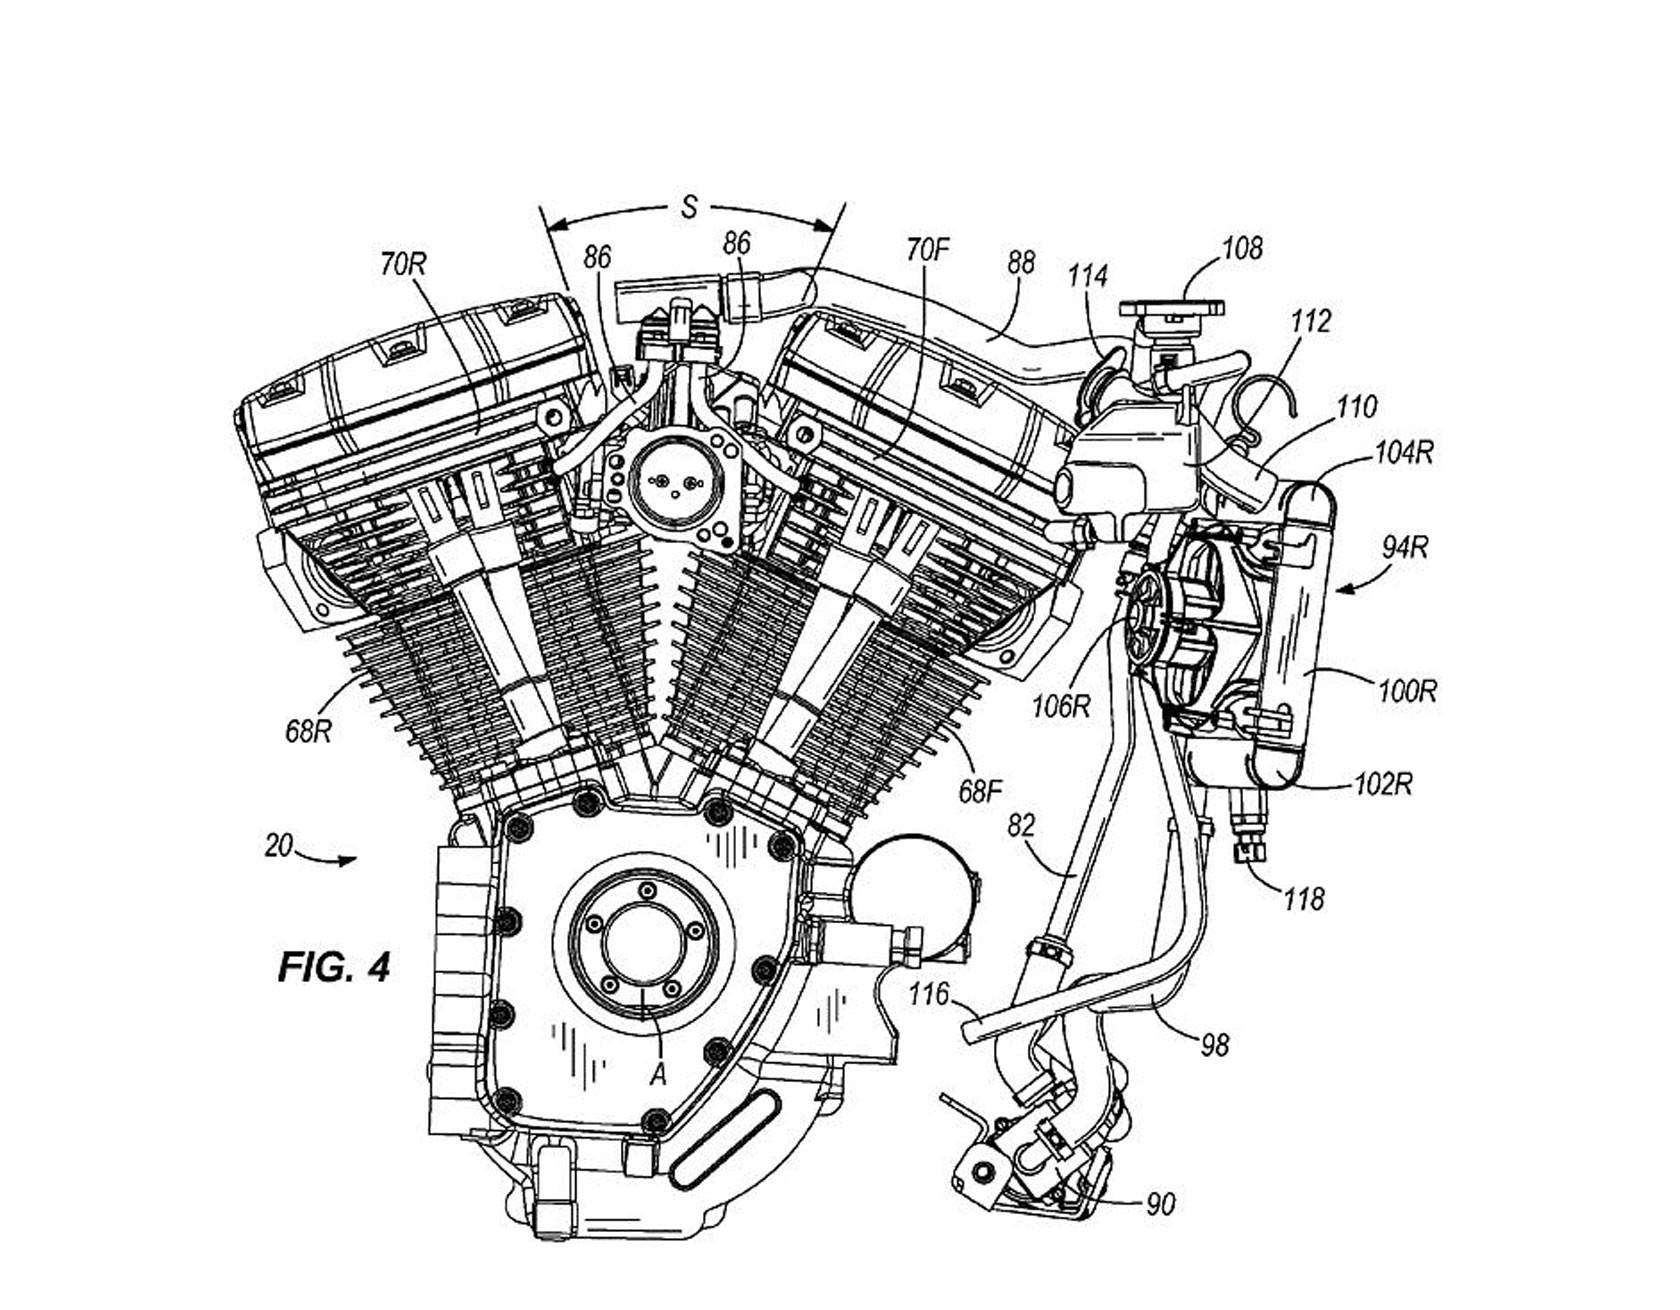 Harley Davidson Golf Cart Engine Diagram Harley Davidson Motor Diagram Wiring Diagram Go Of Harley Davidson Golf Cart Engine Diagram